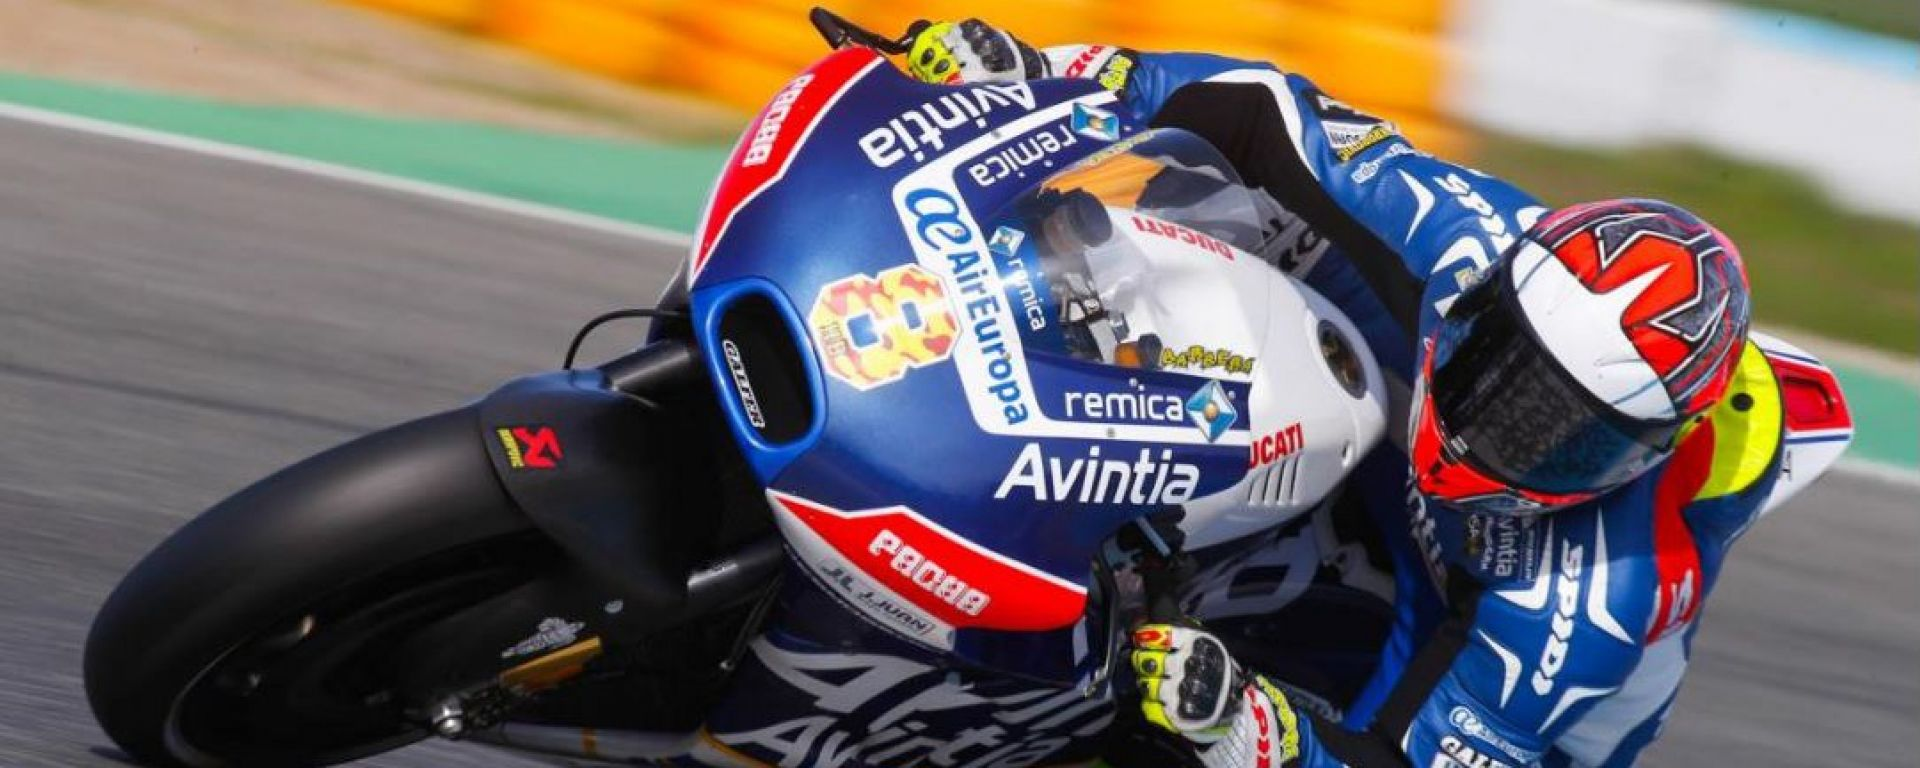 MOTOGP TEST JEREZ: le Ducati del team Avintia davanti a tutti